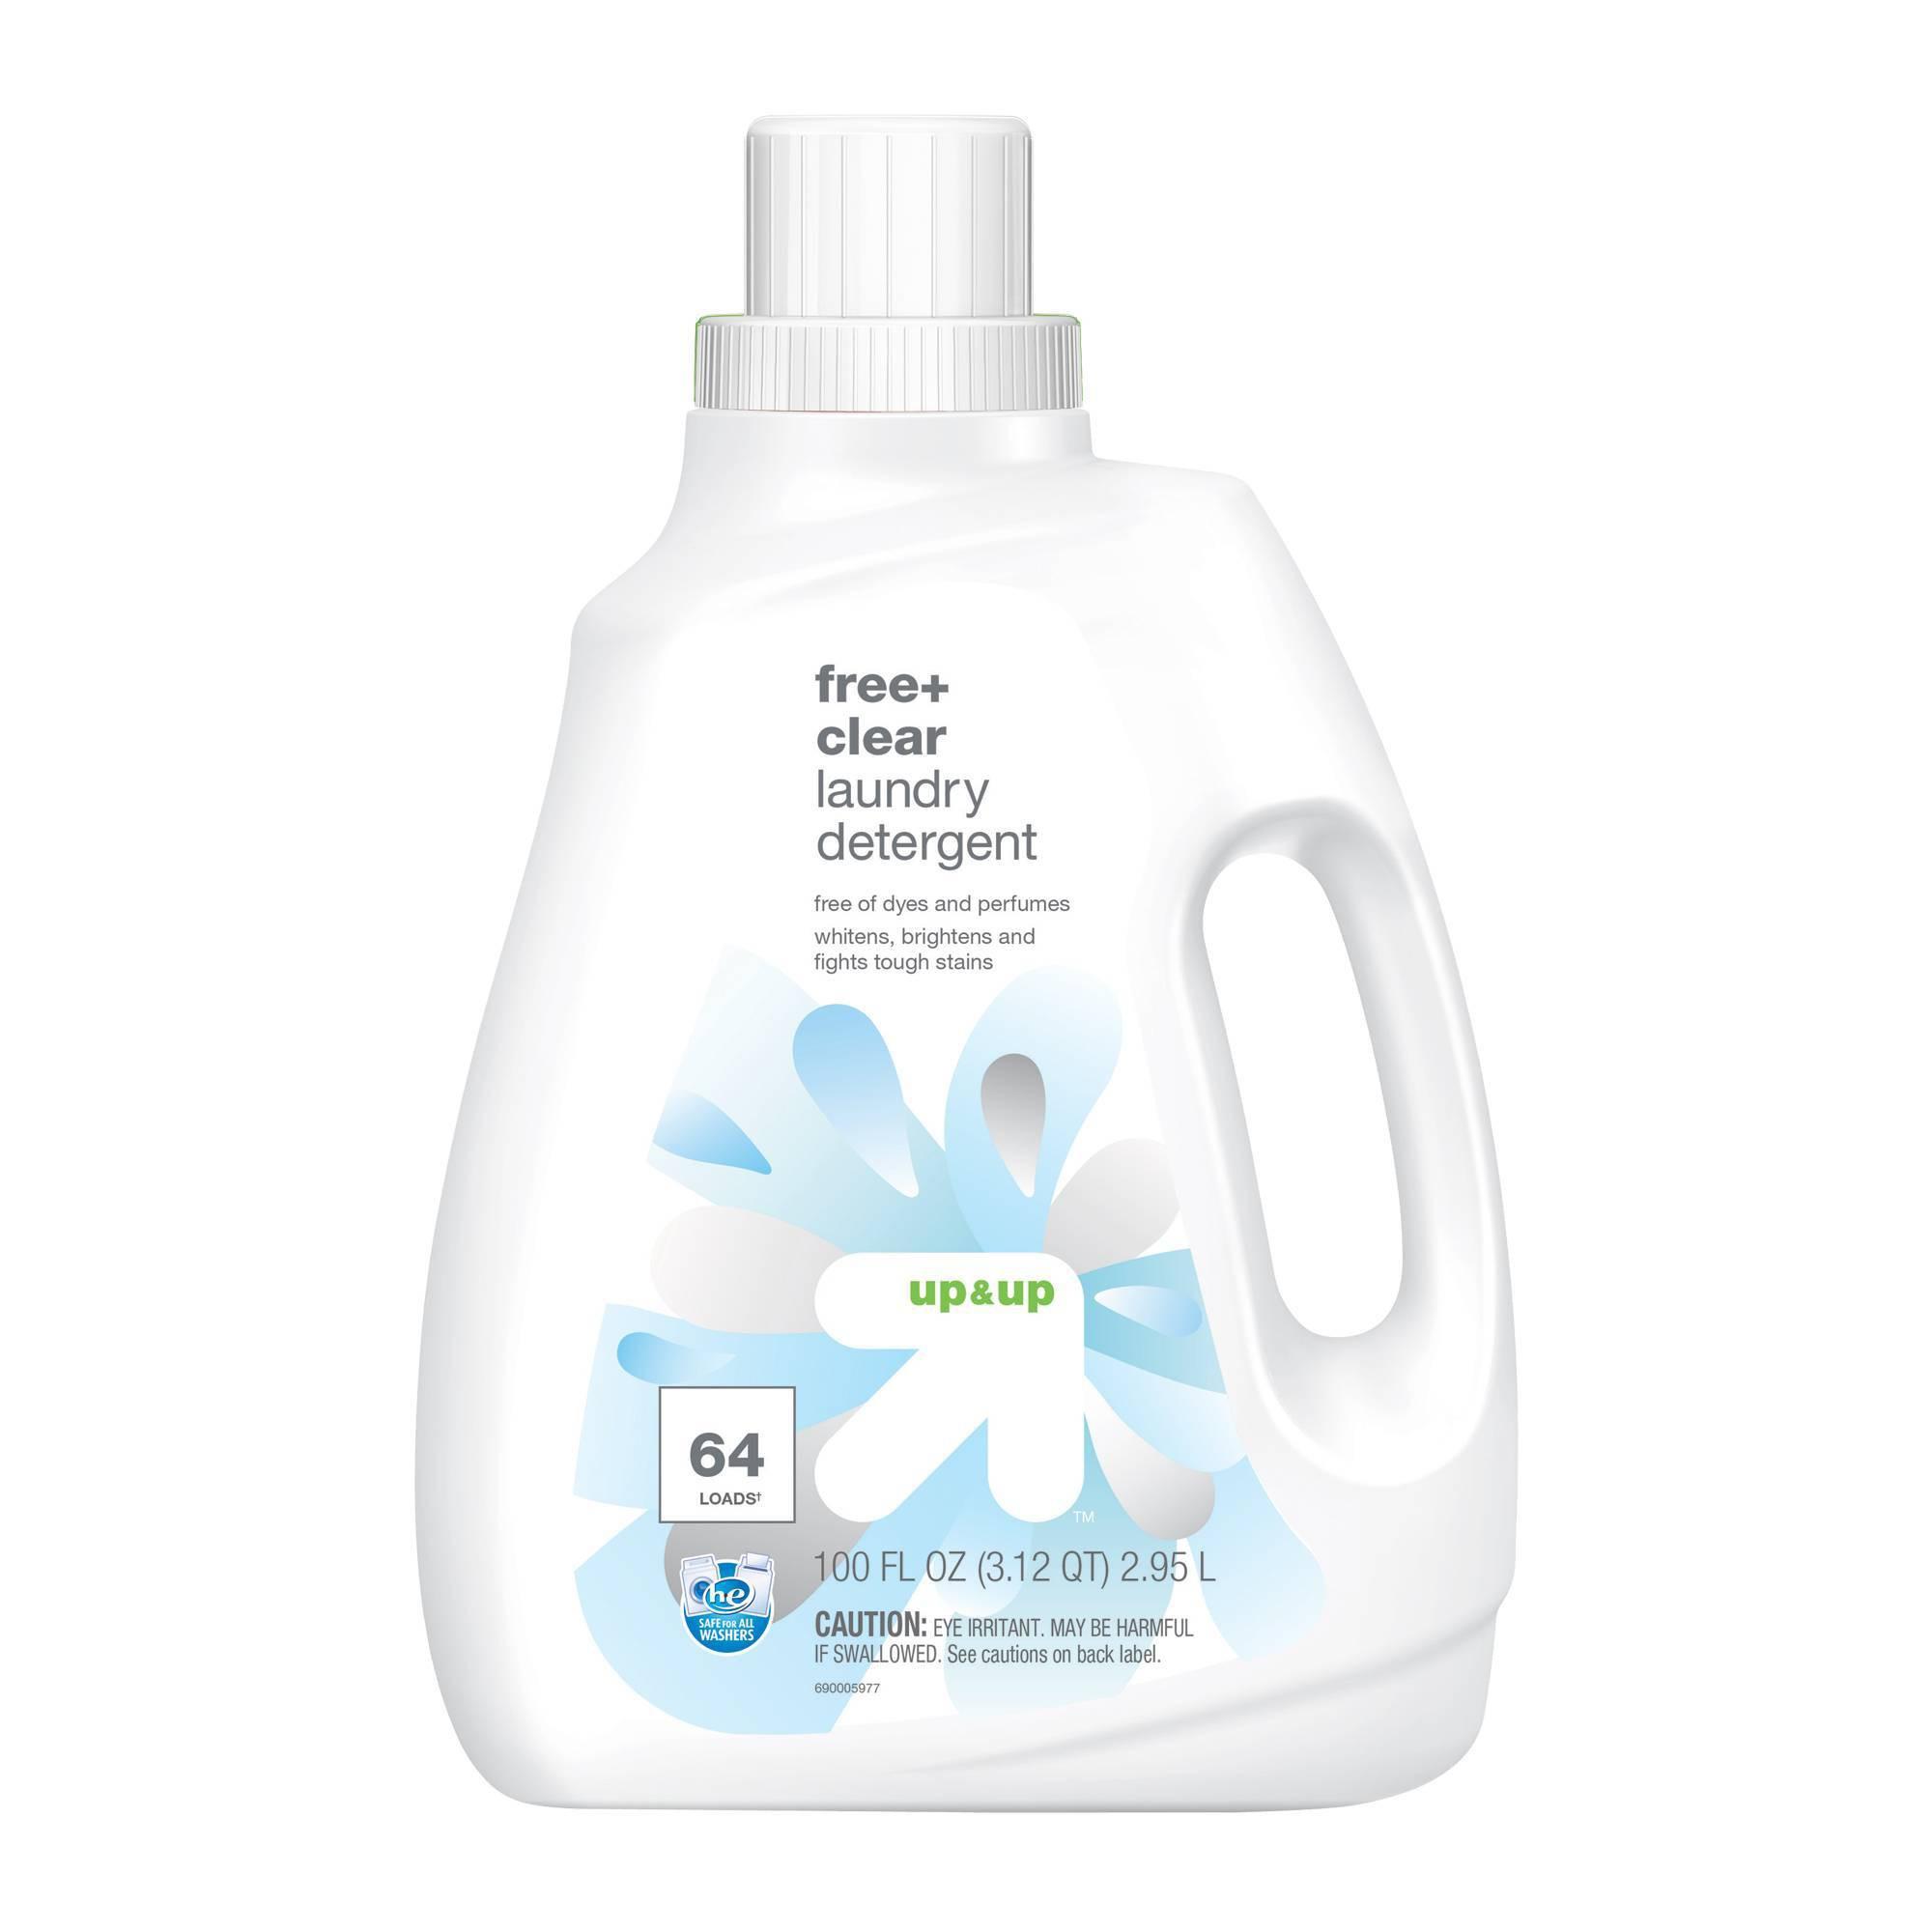 Free Clear He Liquid Laundry Detergent 100oz Up Up In 2020 Laundry Detergent Laundry Liquid Unscented Laundry Detergent